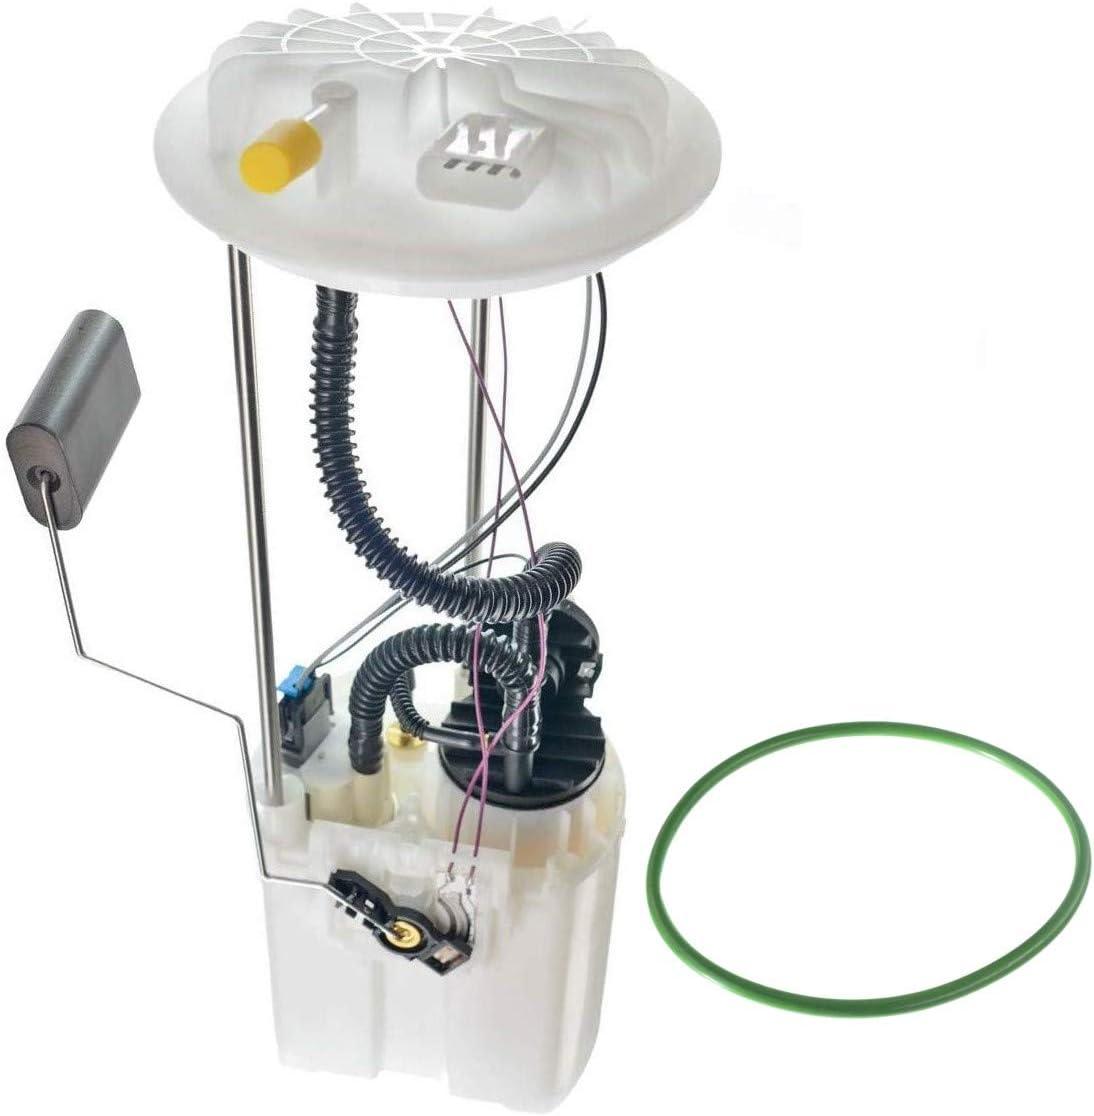 Amazon Com Electric Fuel Pump Assembly For Ram 1500 2012 Ram 2500 2011 2018 Ram 3500 2013 2017 Automotive